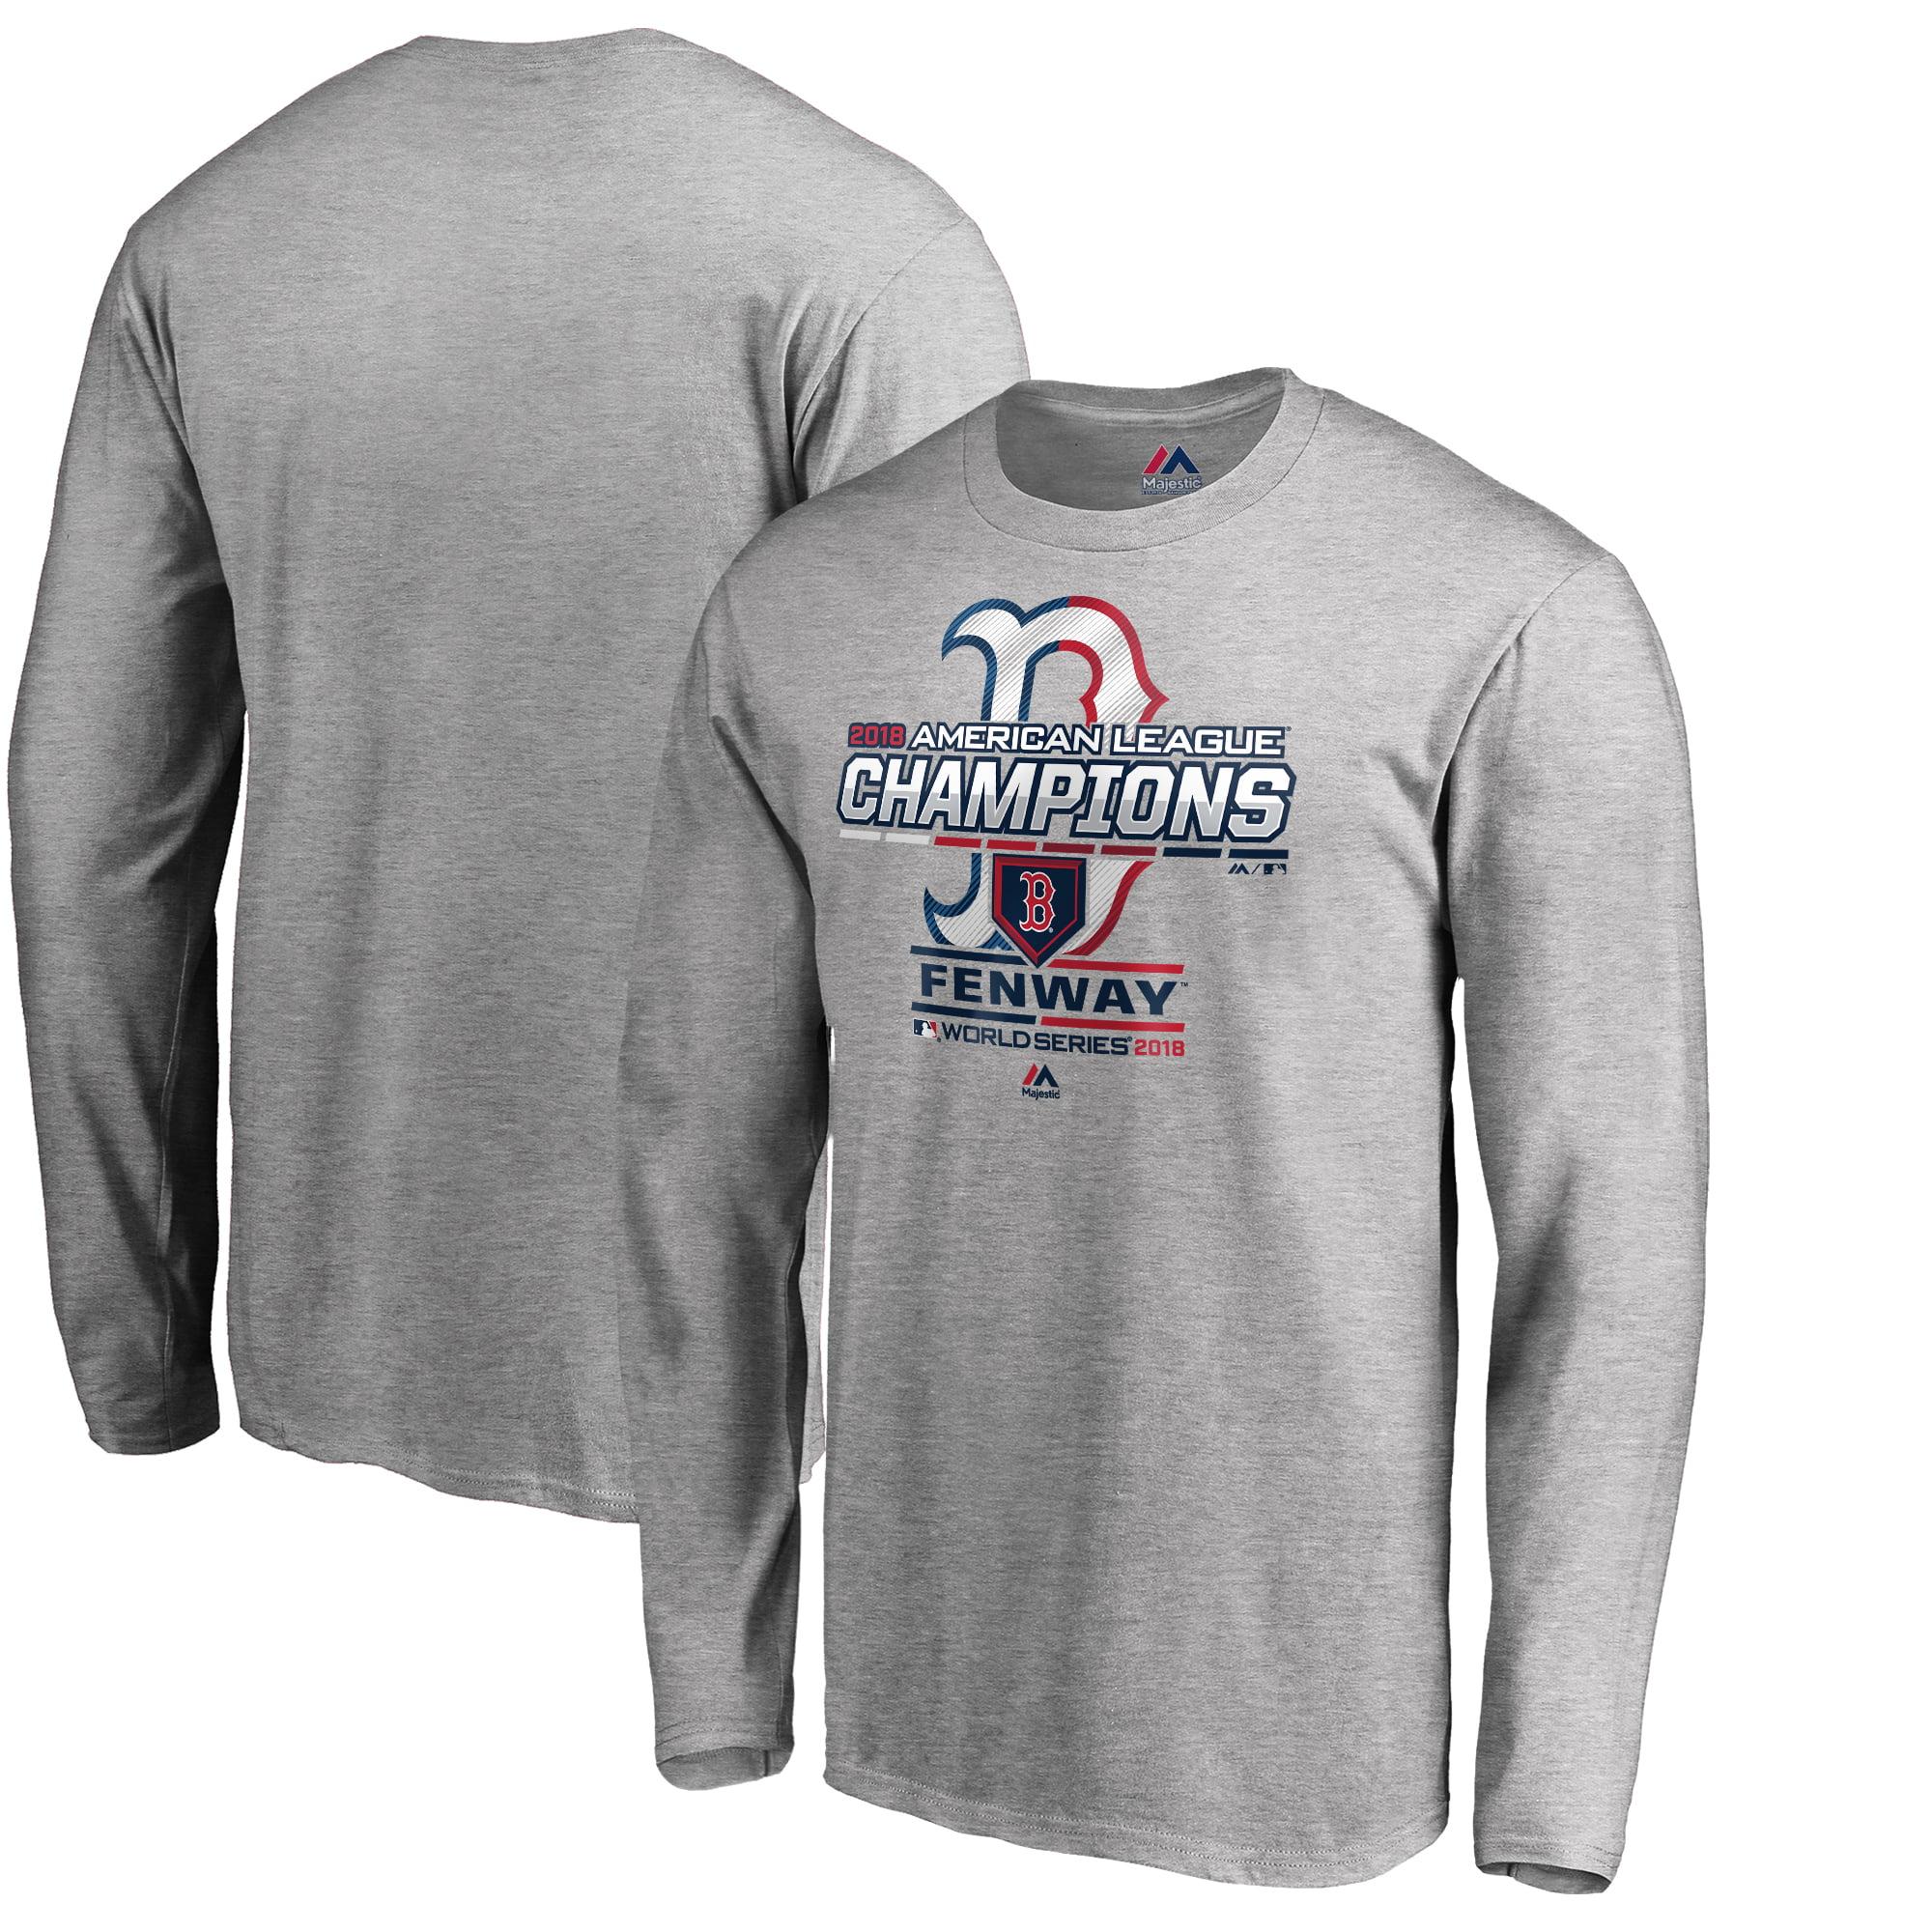 Boston Red Sox Majestic 2018 American League Champions Locker Room Big & Tall Long Sleeve T-Shirt - Heather Gray